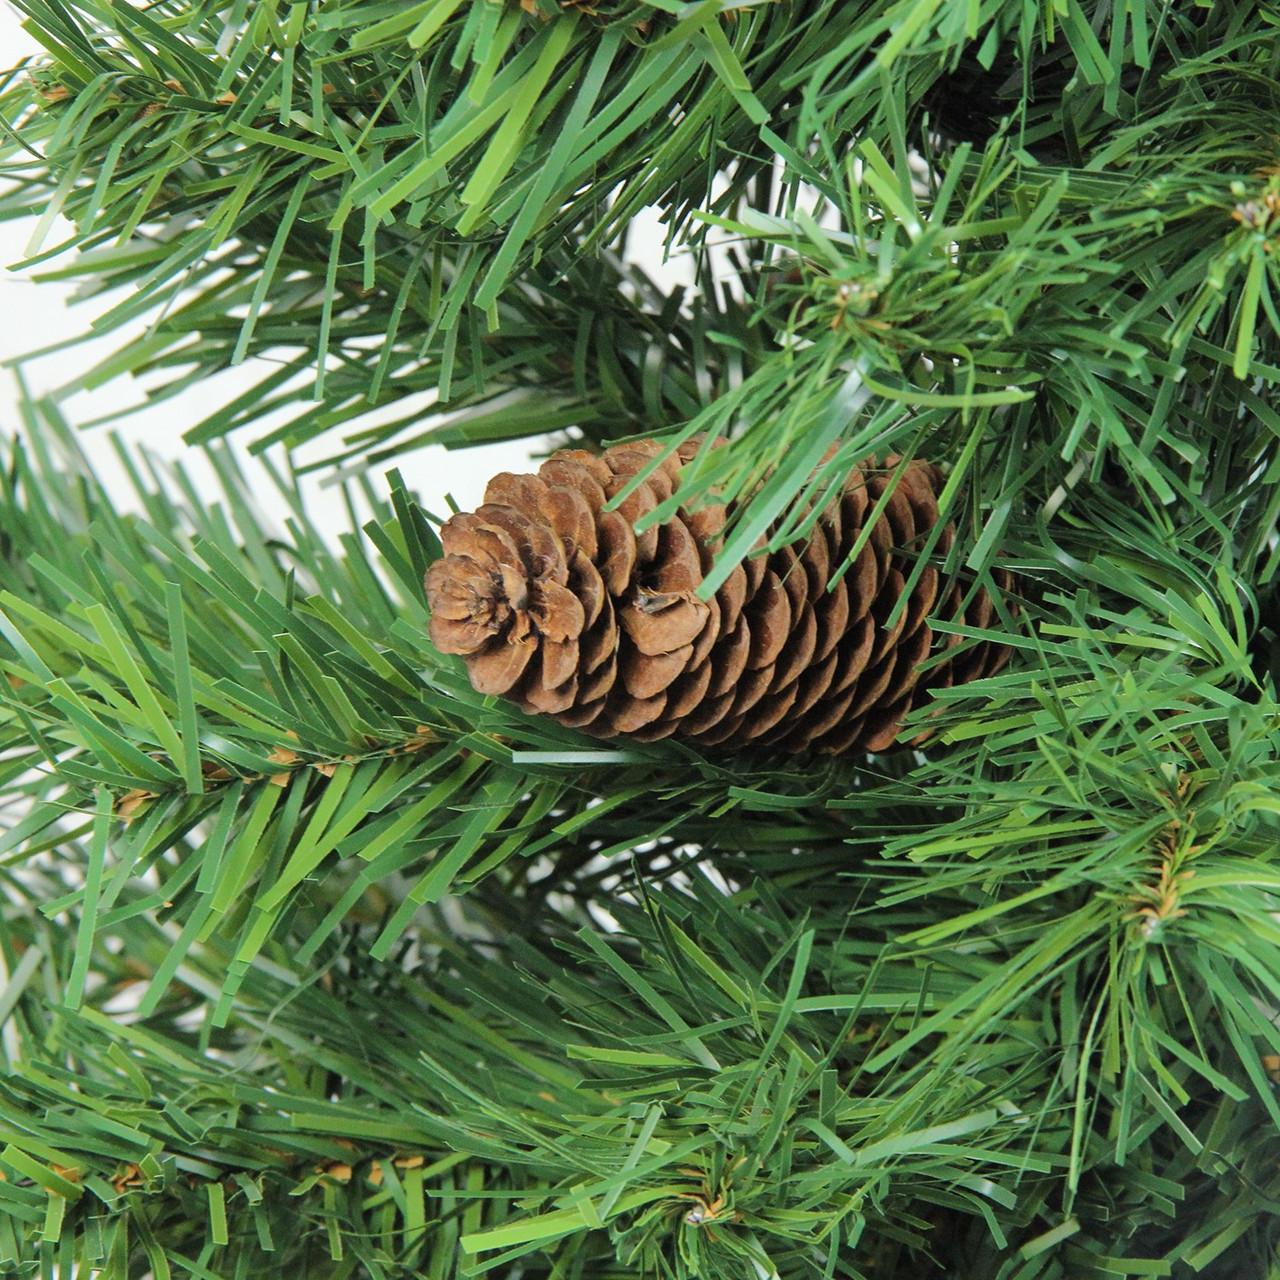 3 x 22 dakota red pine full artificial christmas tree with pine cones unlit 32266796 - Christmas Tree With Pine Cones